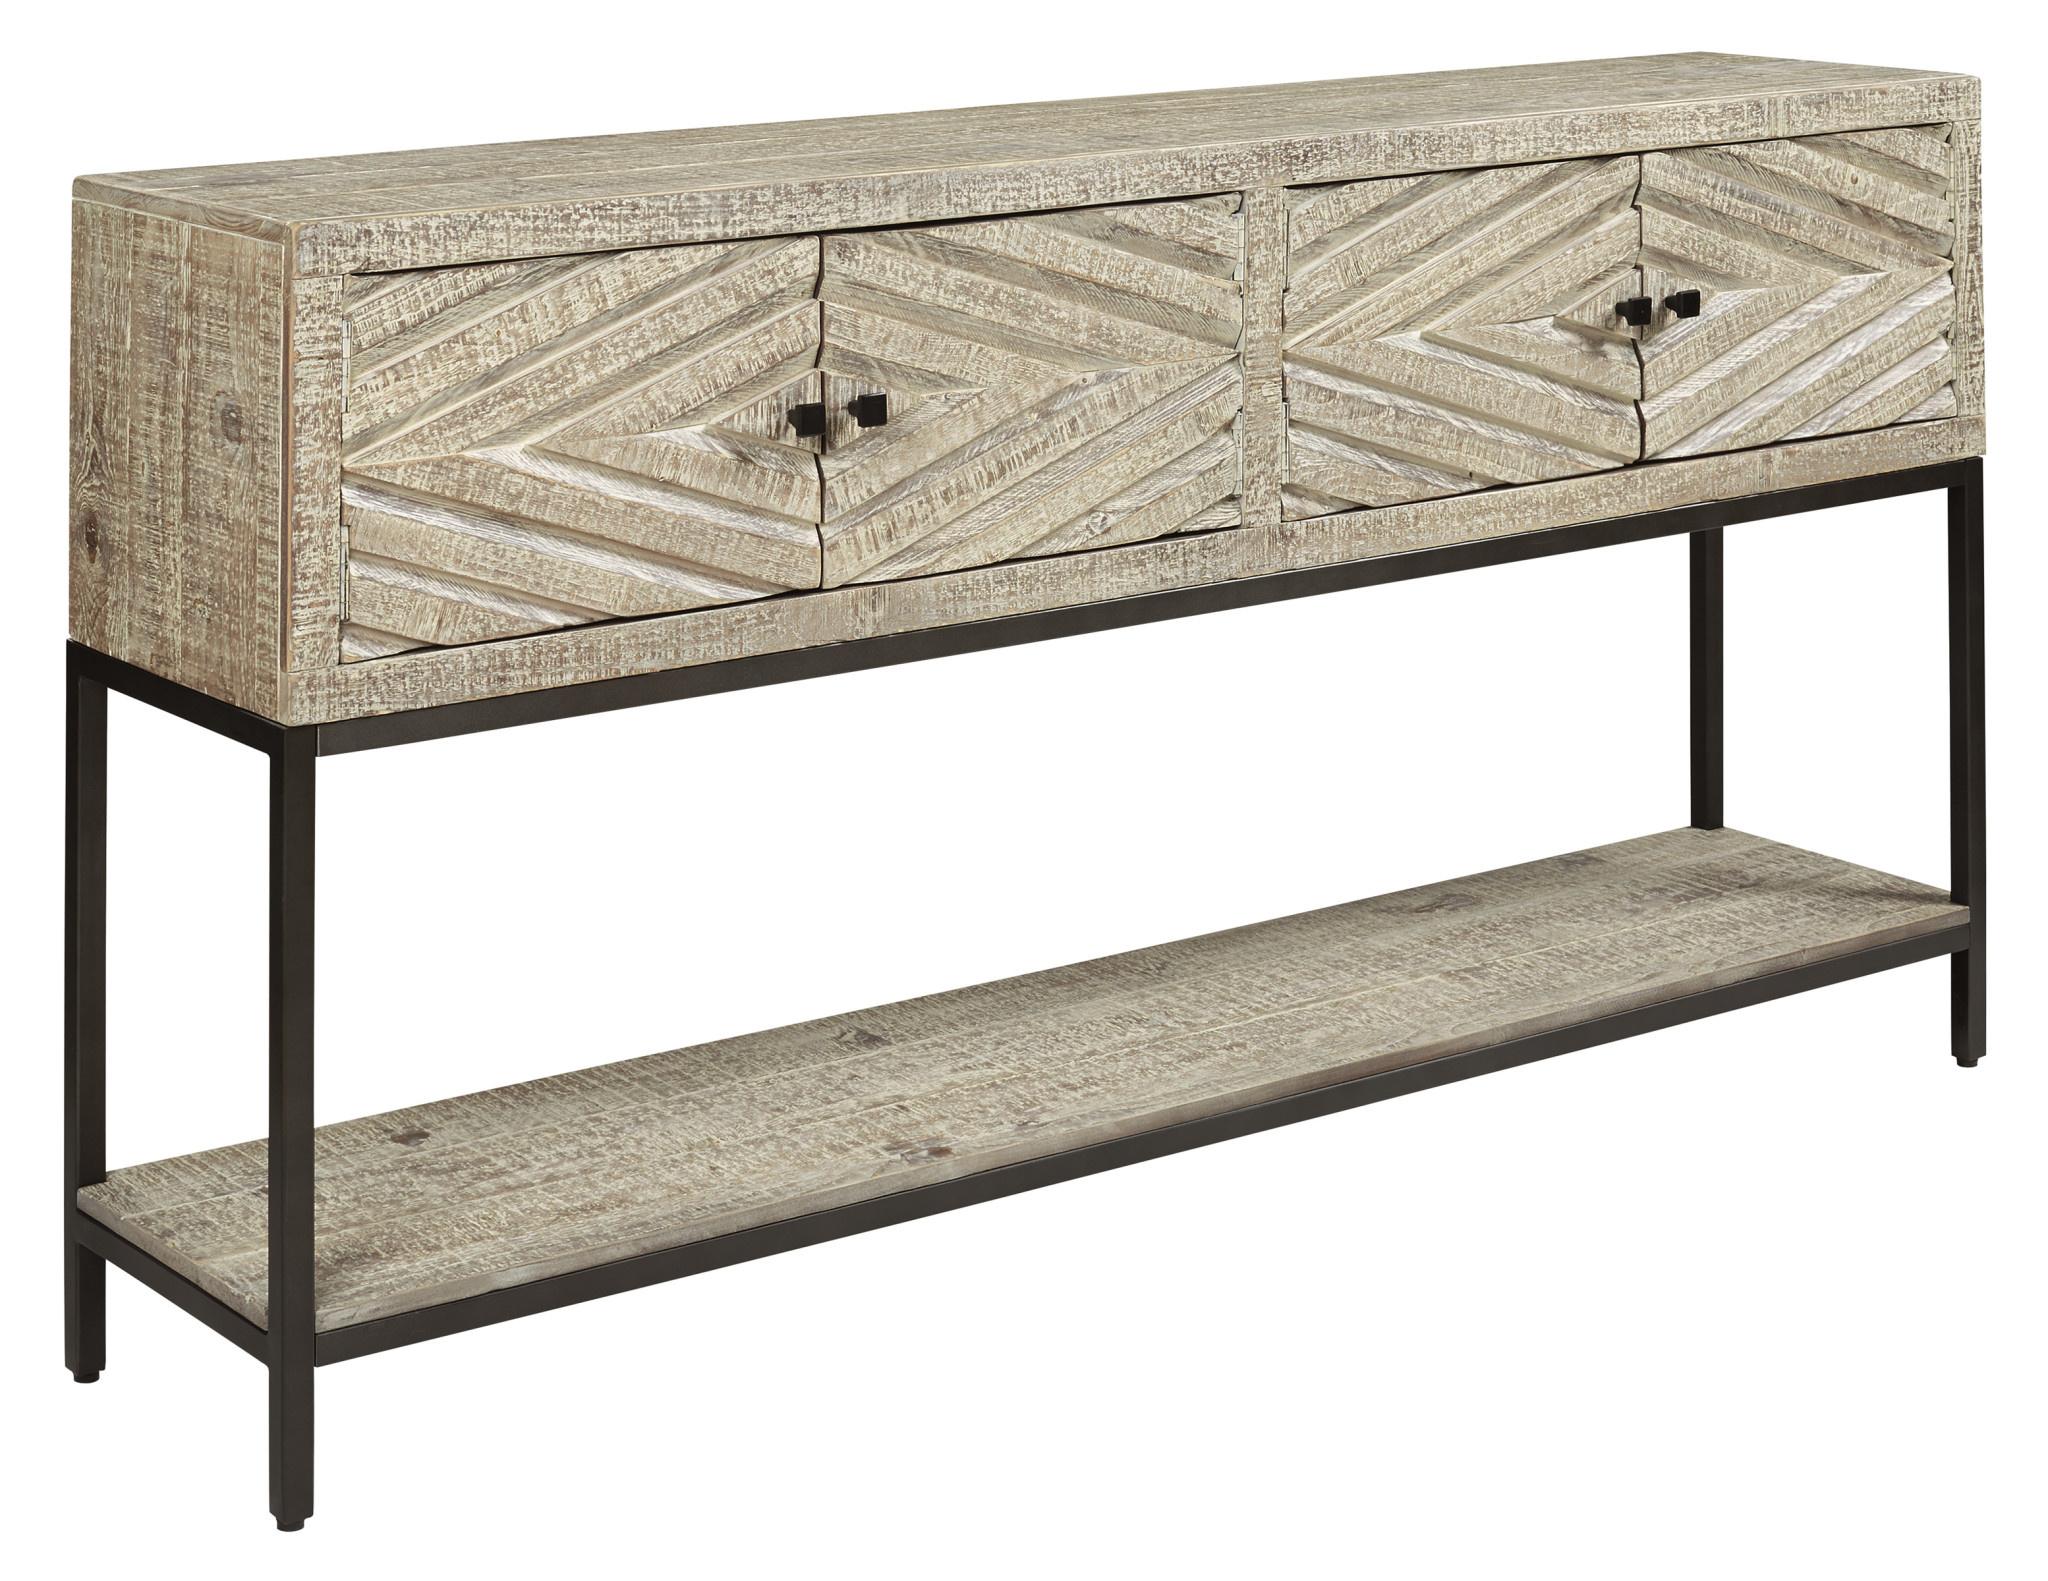 "Signature Design ""Roanley"" Console Sofa Table- Distressed White- A4000262"